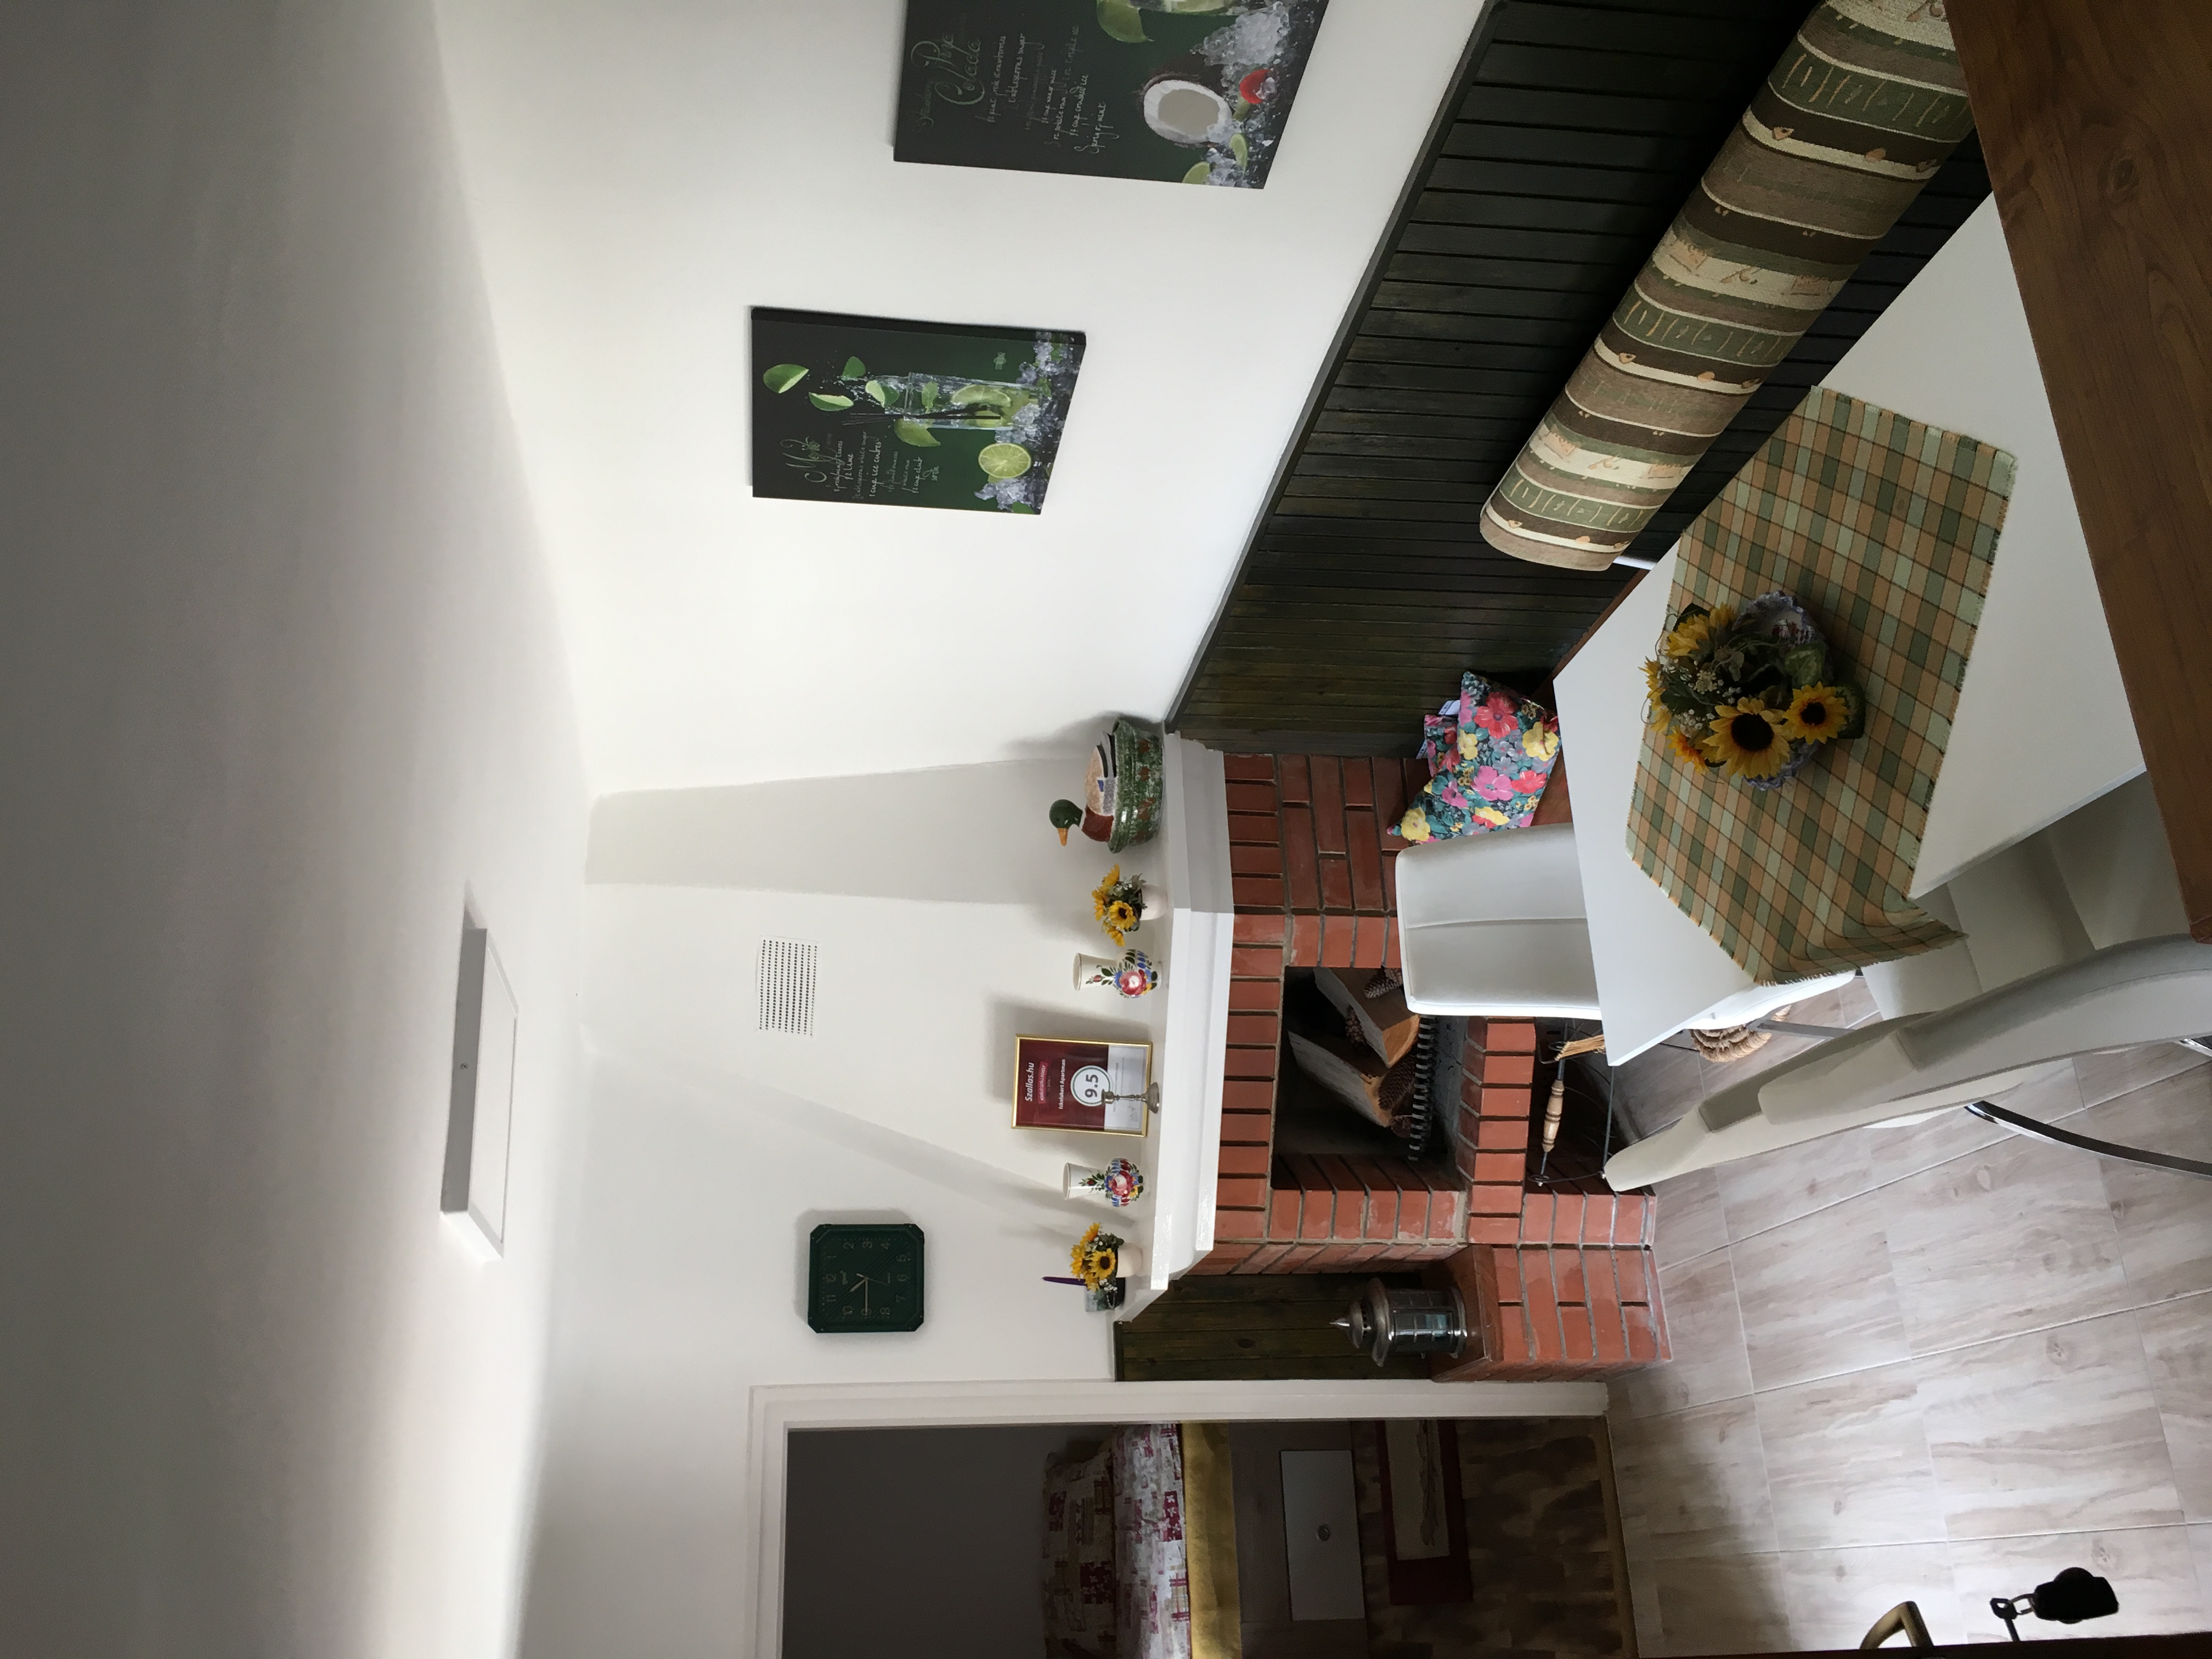 Kirandulastervezo-Sarospatak-Iskolakert-Apartman-13.JPG